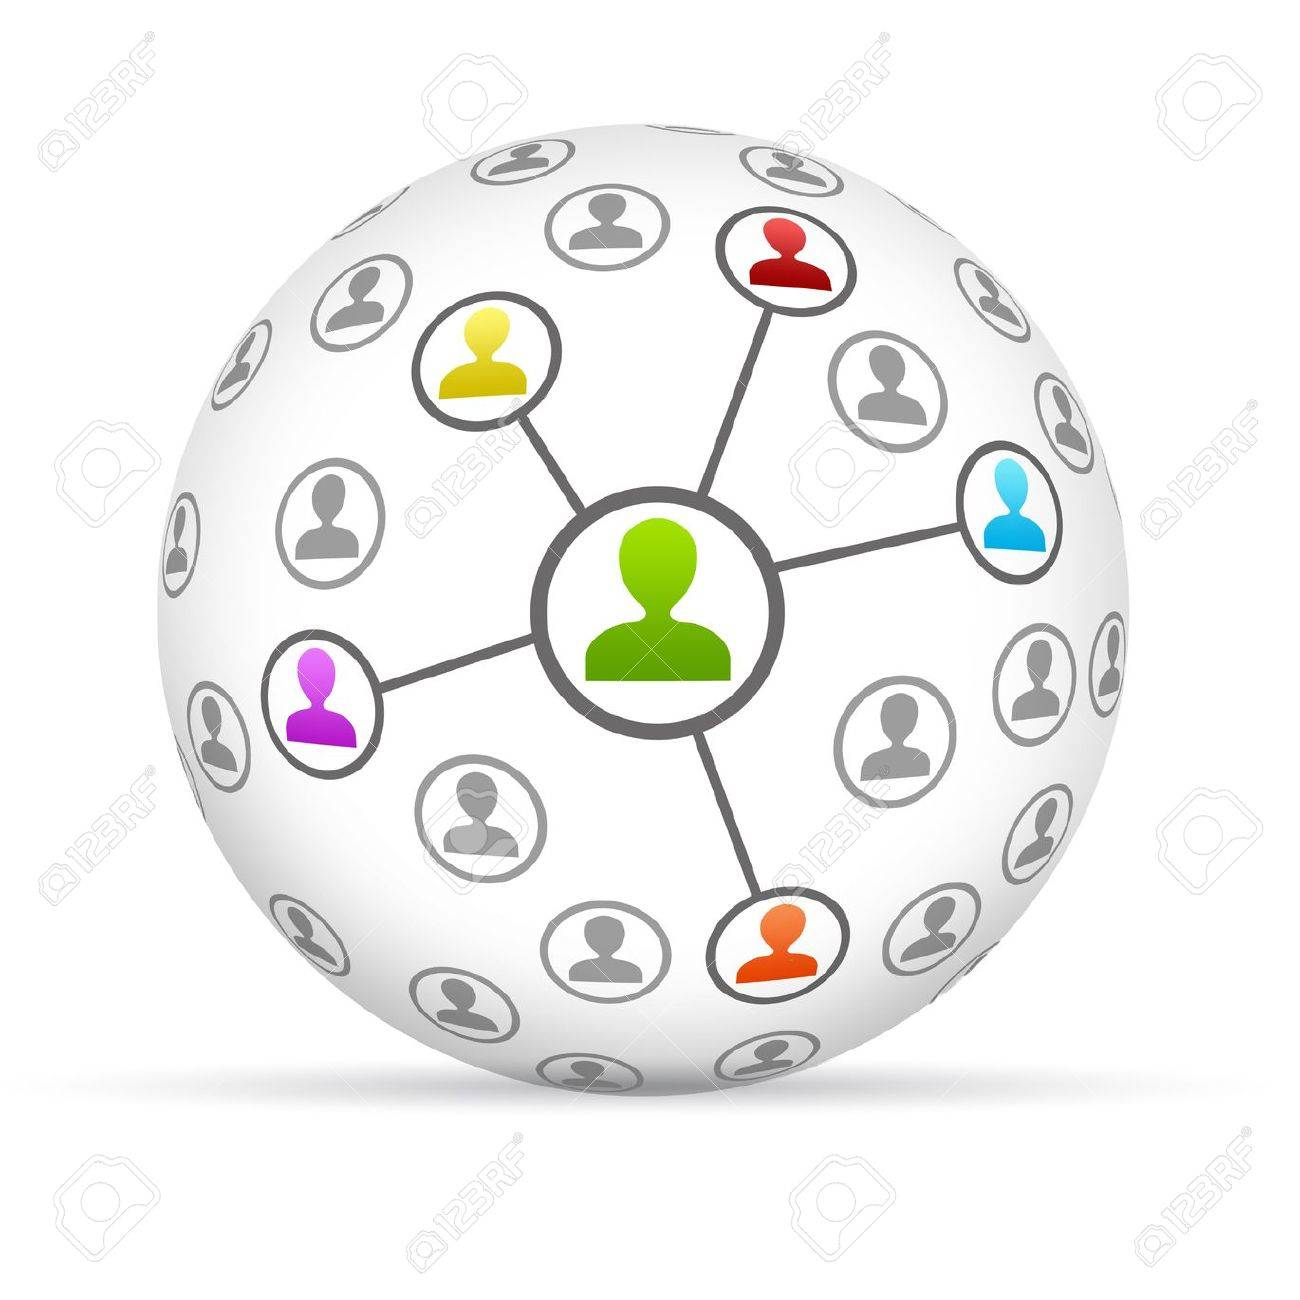 3d Social Network Sphere on white background. Stock Photo - 13779205